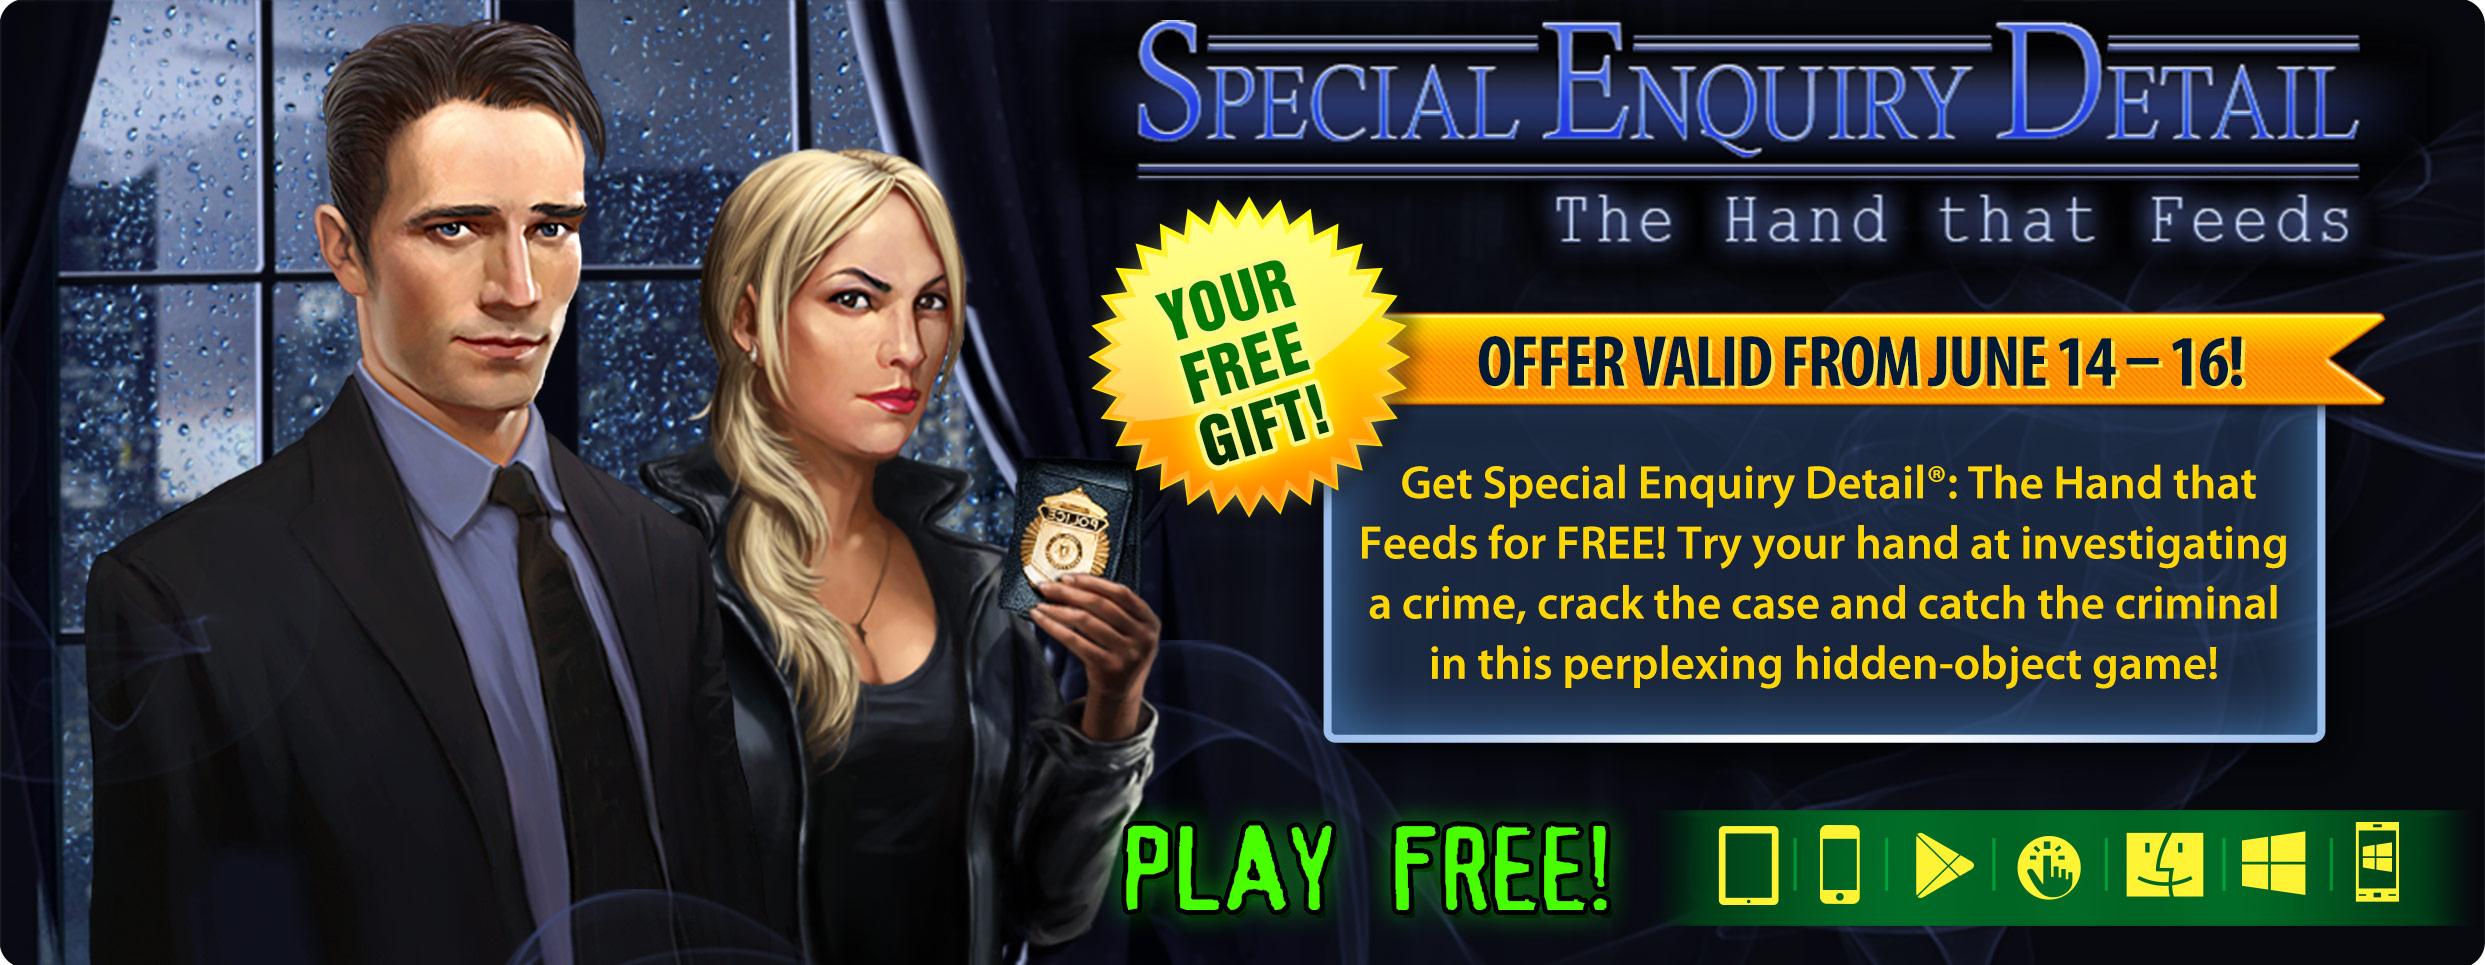 http://www.g5e.com/images/sale/SED_sale.jpg